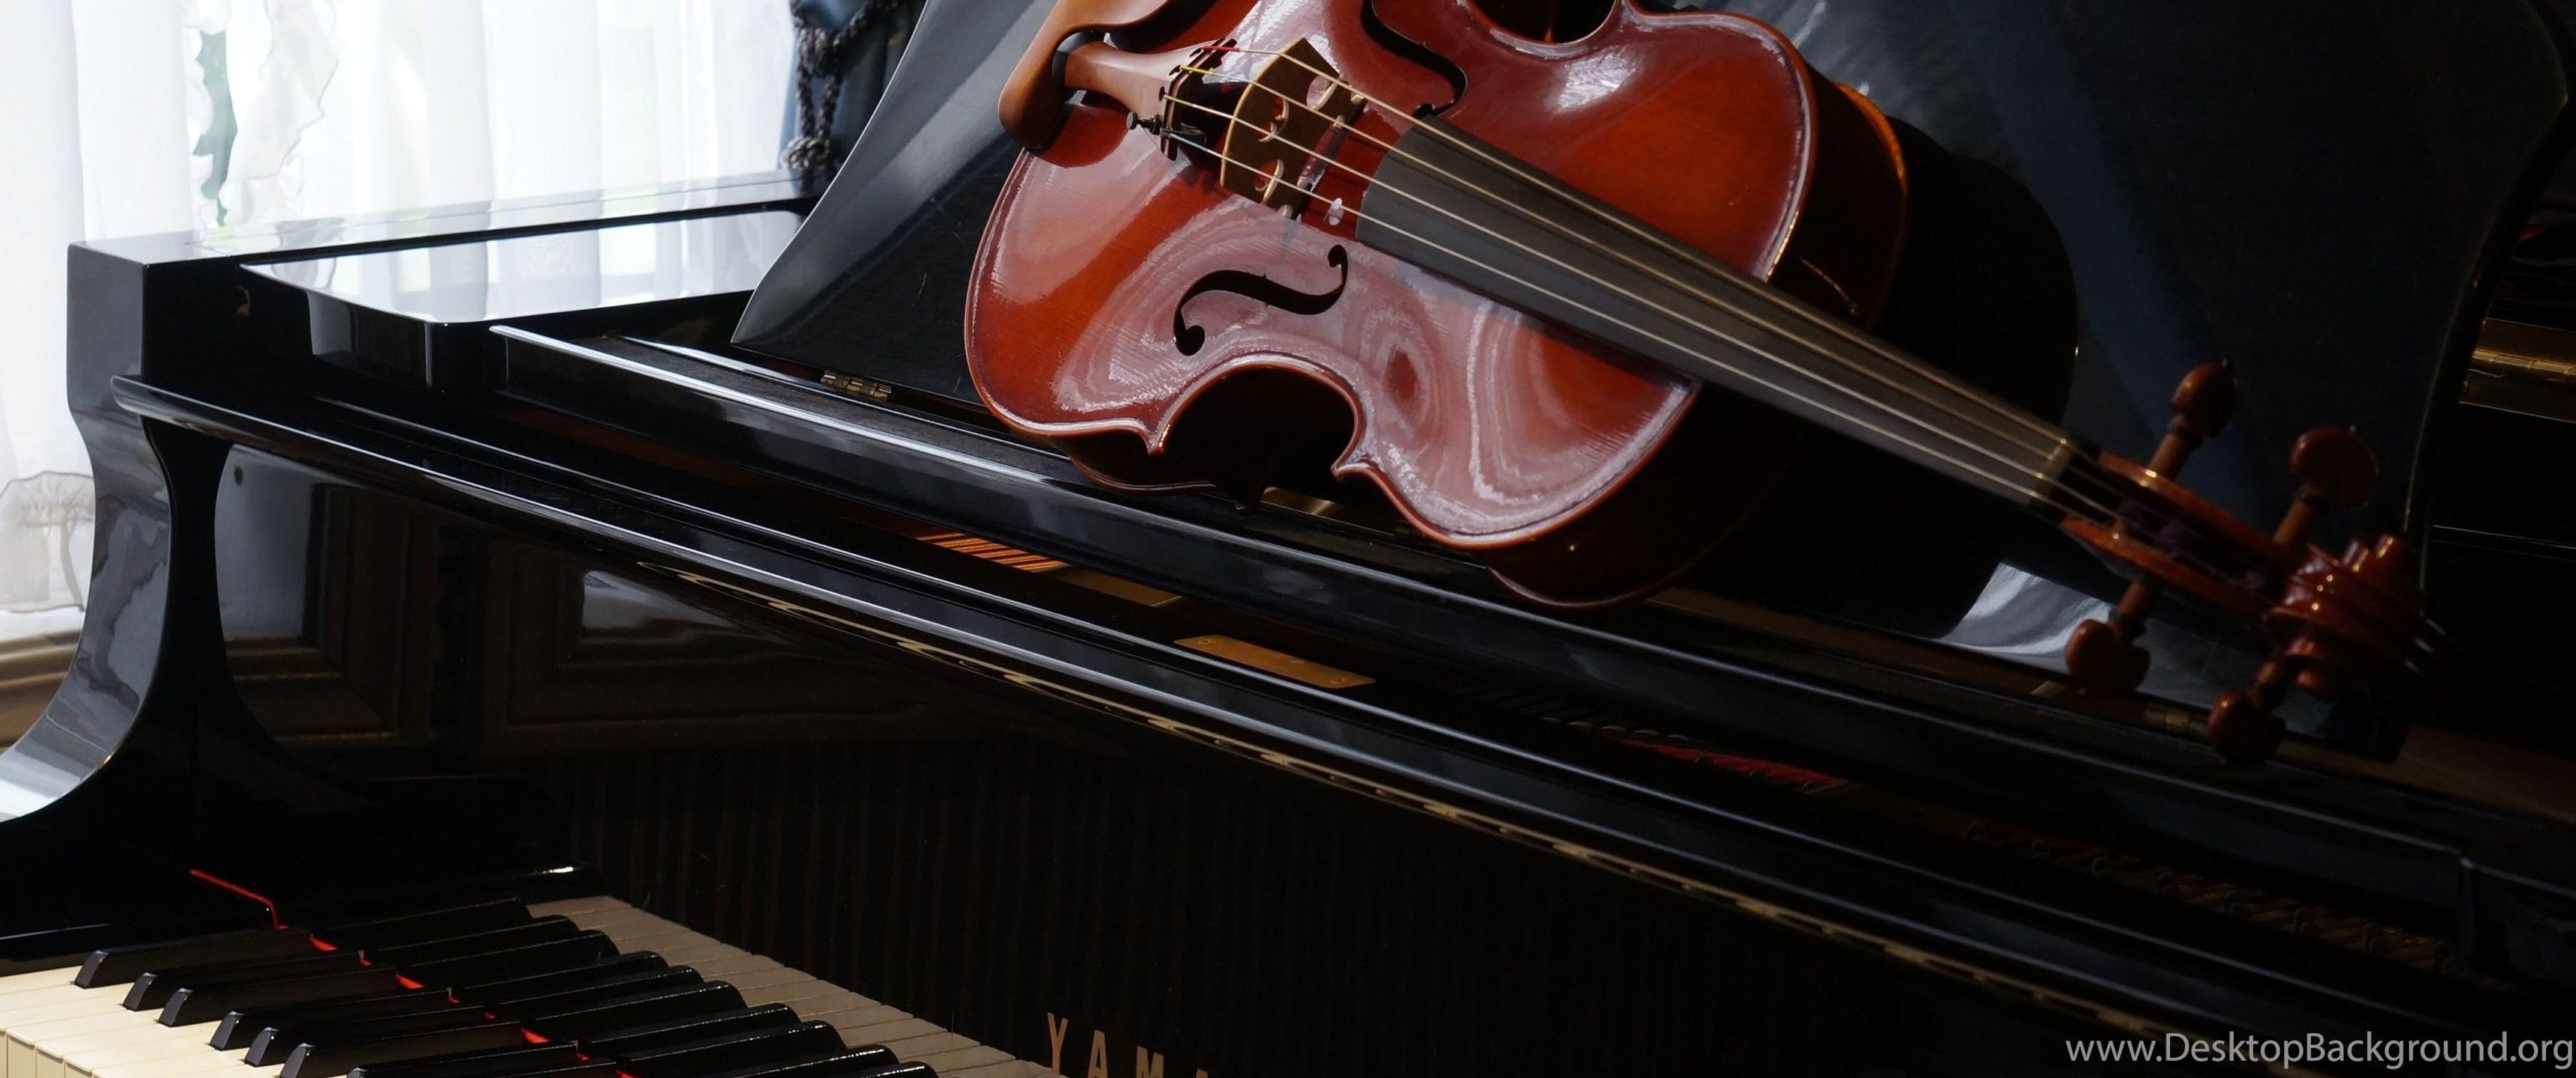 Violin Piano Wallpapers Wallpaper Desktop Background